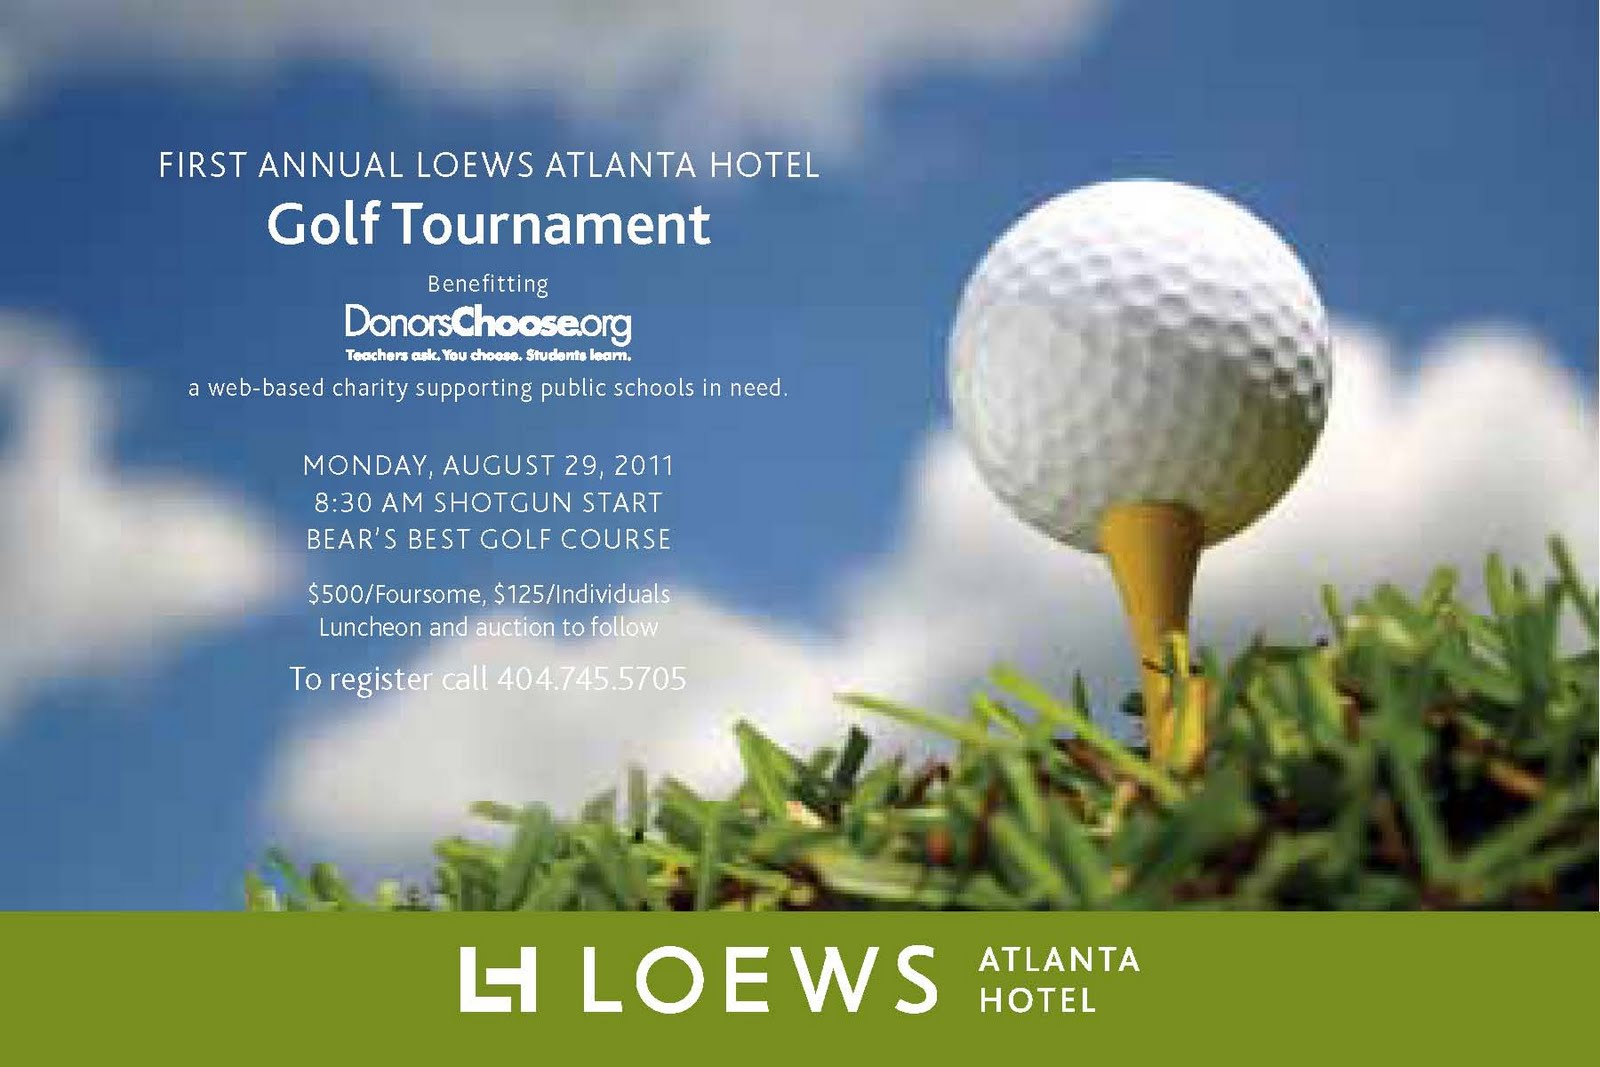 golf tournament flyer template download free juve cenitdelacabrera co